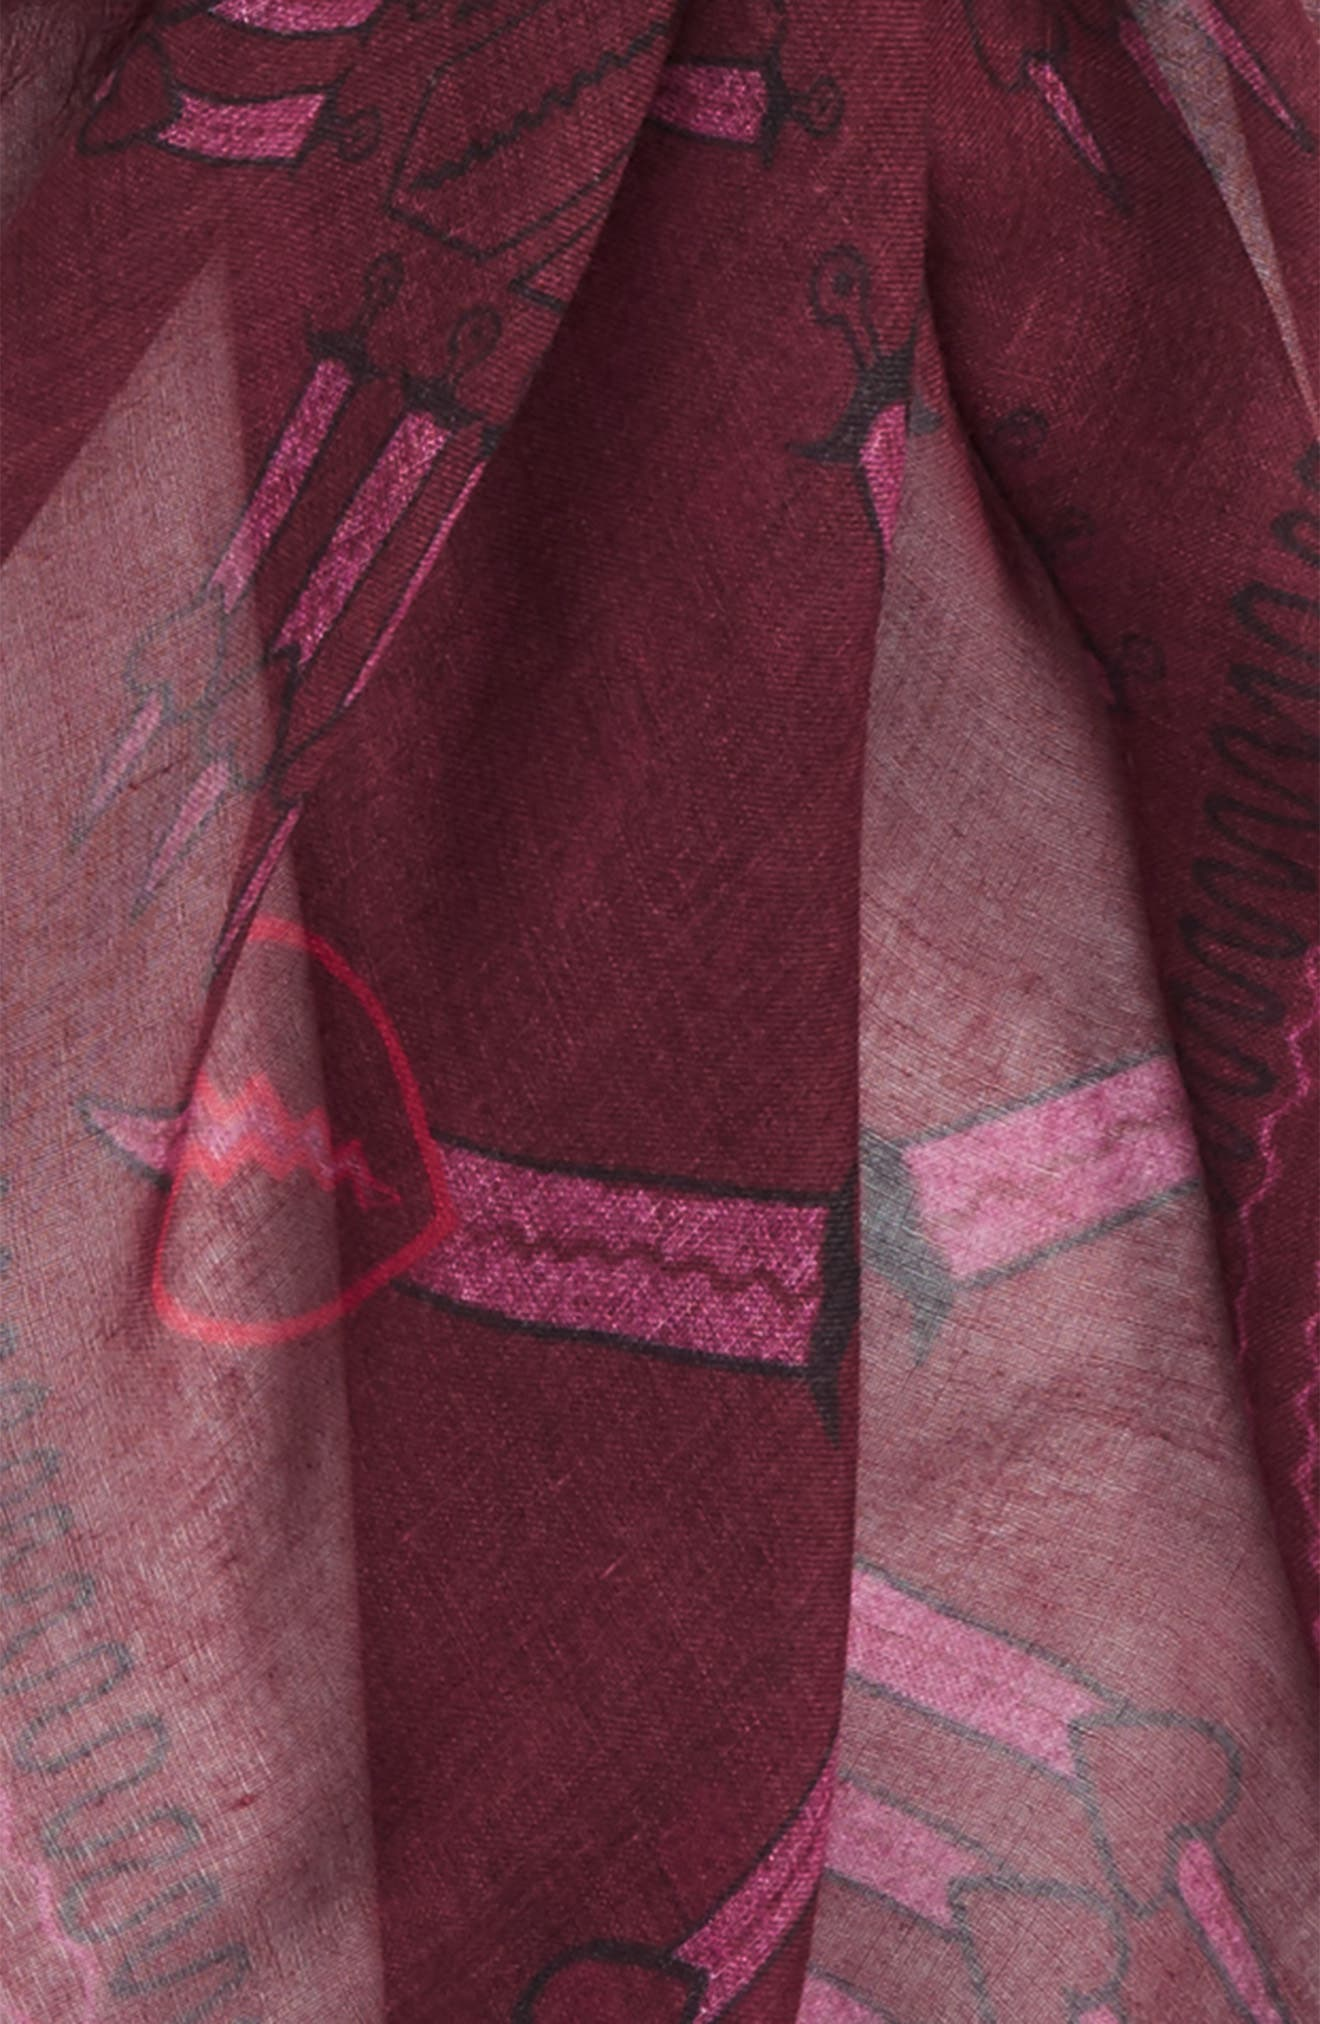 Loveblade Modal & Cashmere Scarf,                             Alternate thumbnail 3, color,                             Crimson